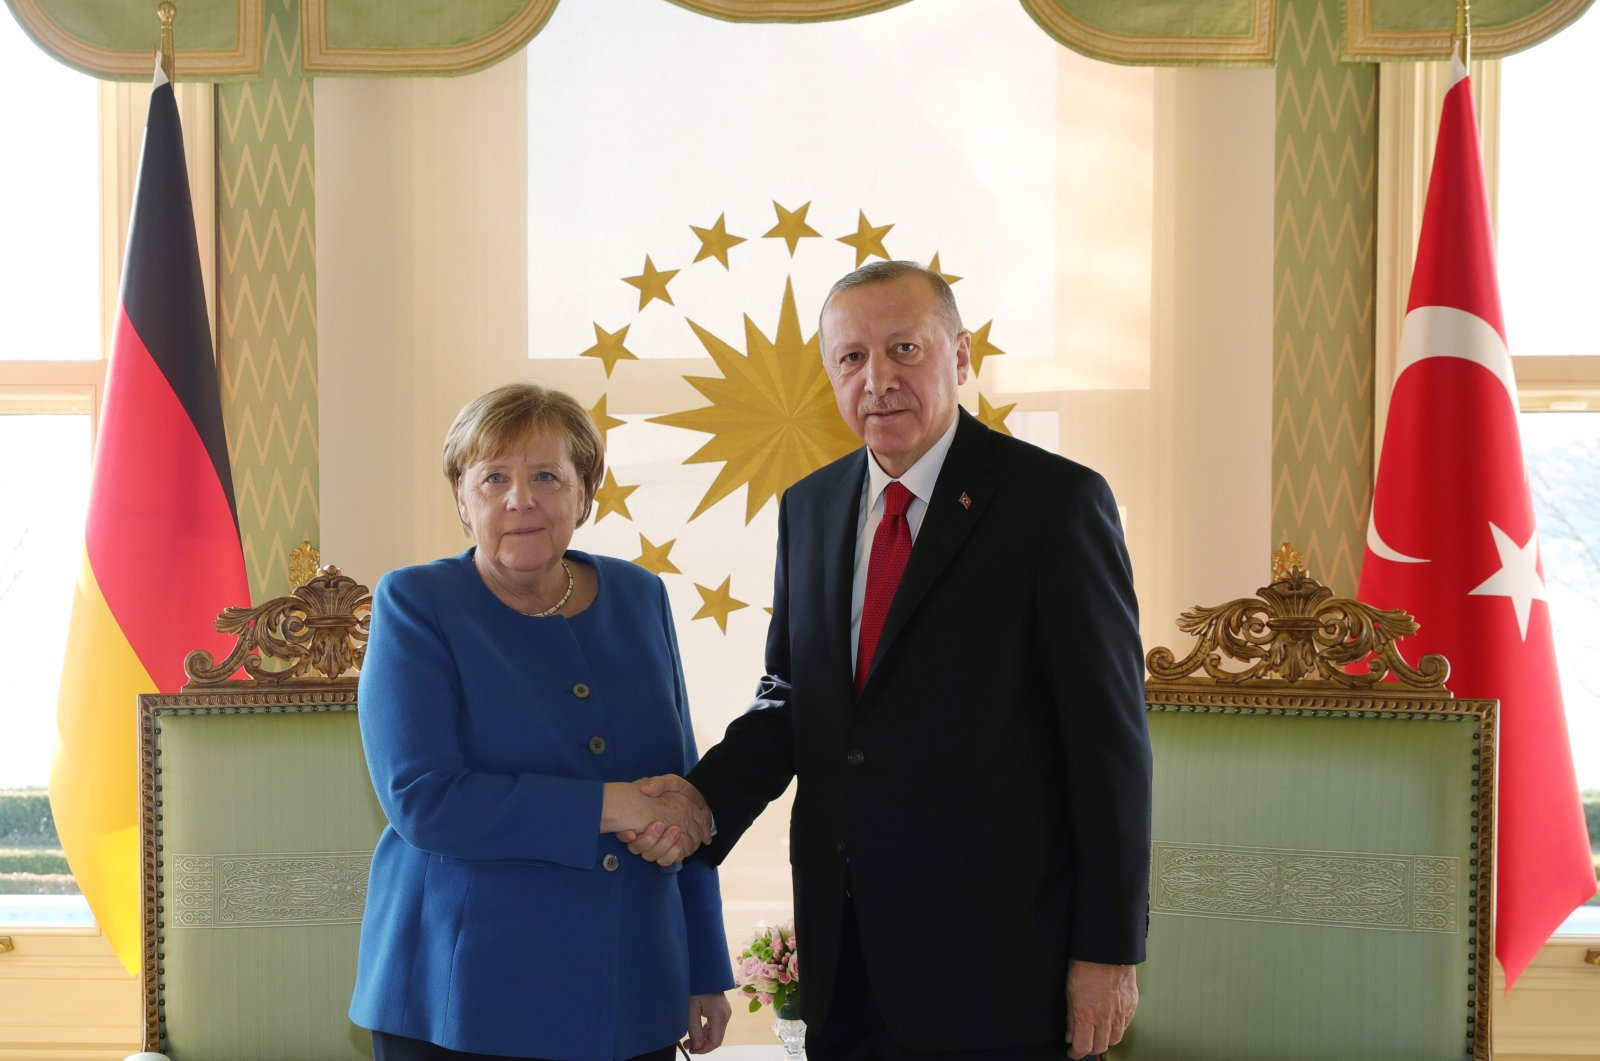 German Chancellor Angela Merkel shakes hands with President Tayyip Erdoğan during their meeting in Istanbul, Turkey, Jan. 24, 2020. (Reuters Photo)